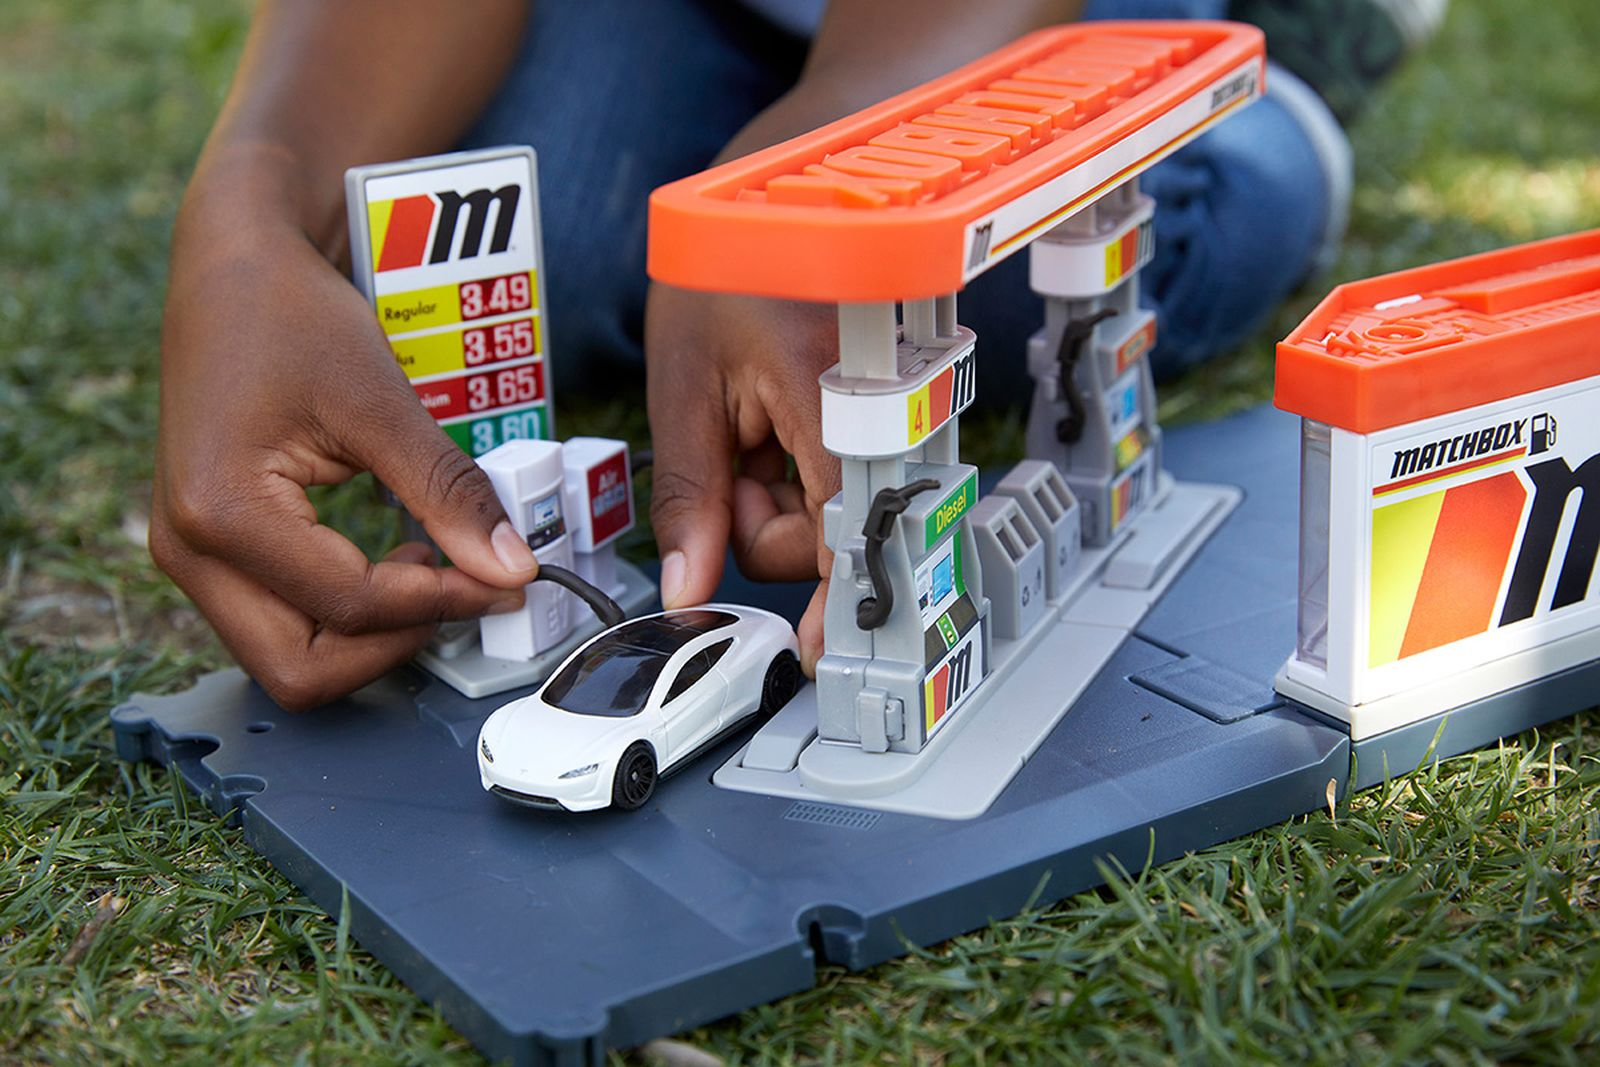 mattel-matchbox-tesla-roadster-04